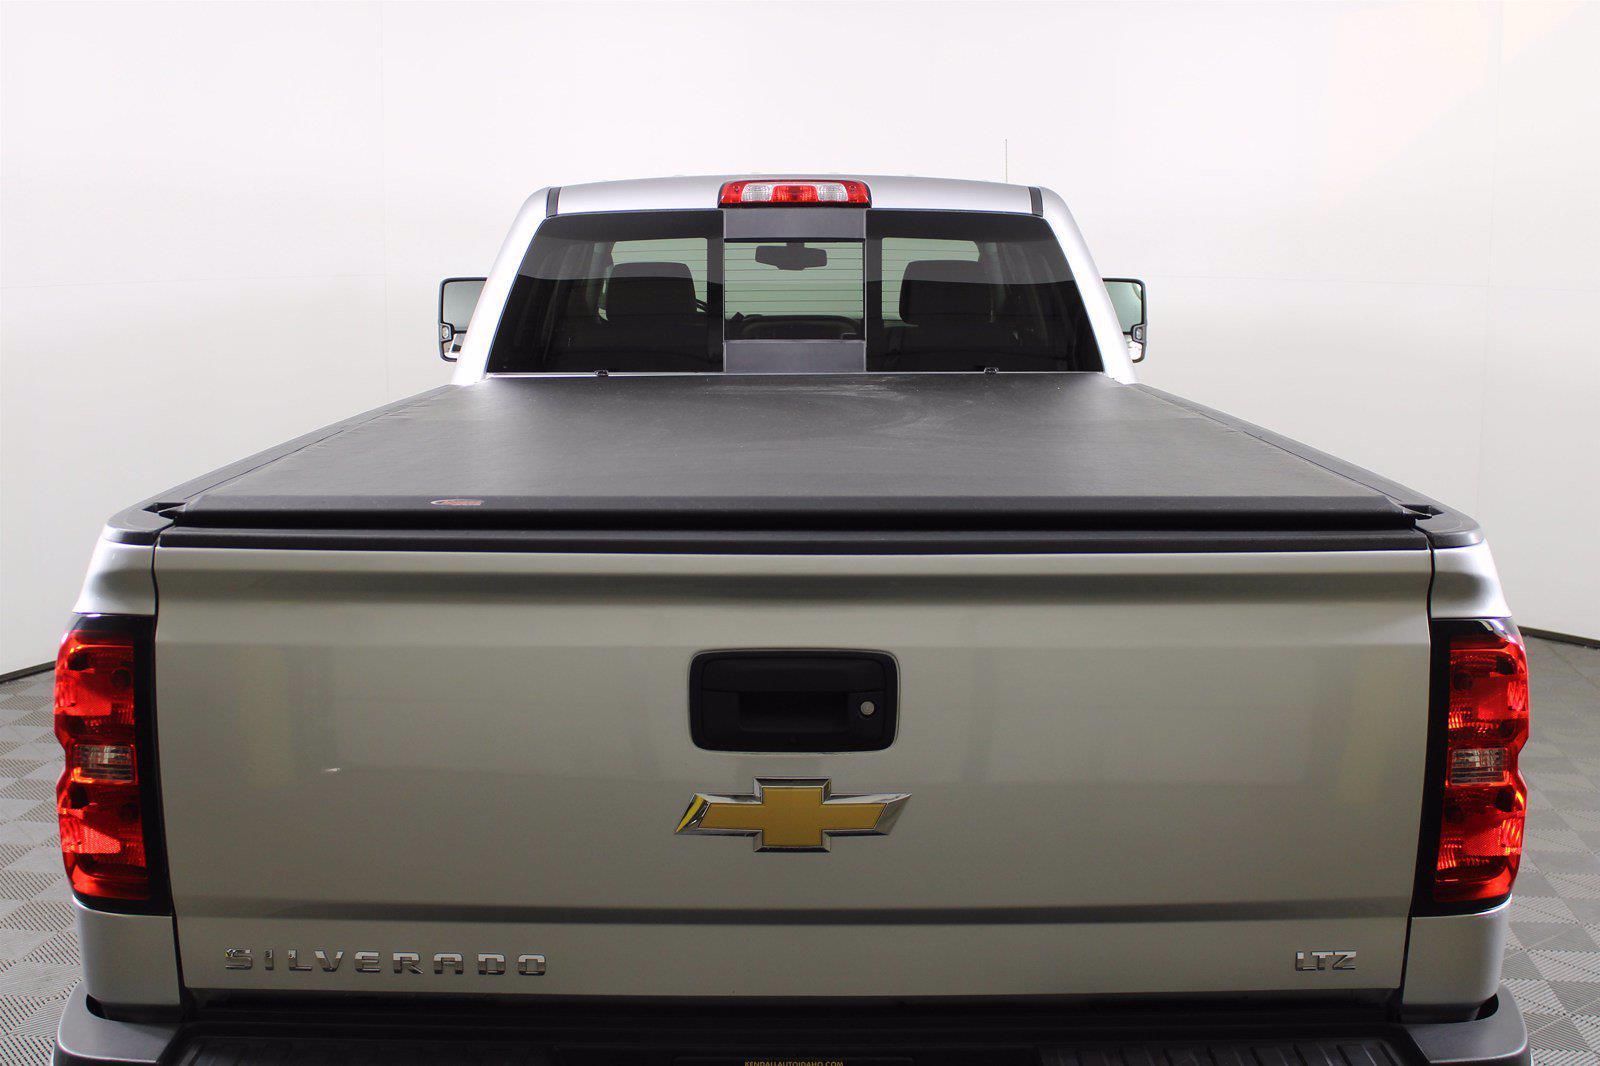 2017 Chevrolet Silverado 3500 Crew Cab 4x4, Pickup #D111017A - photo 2